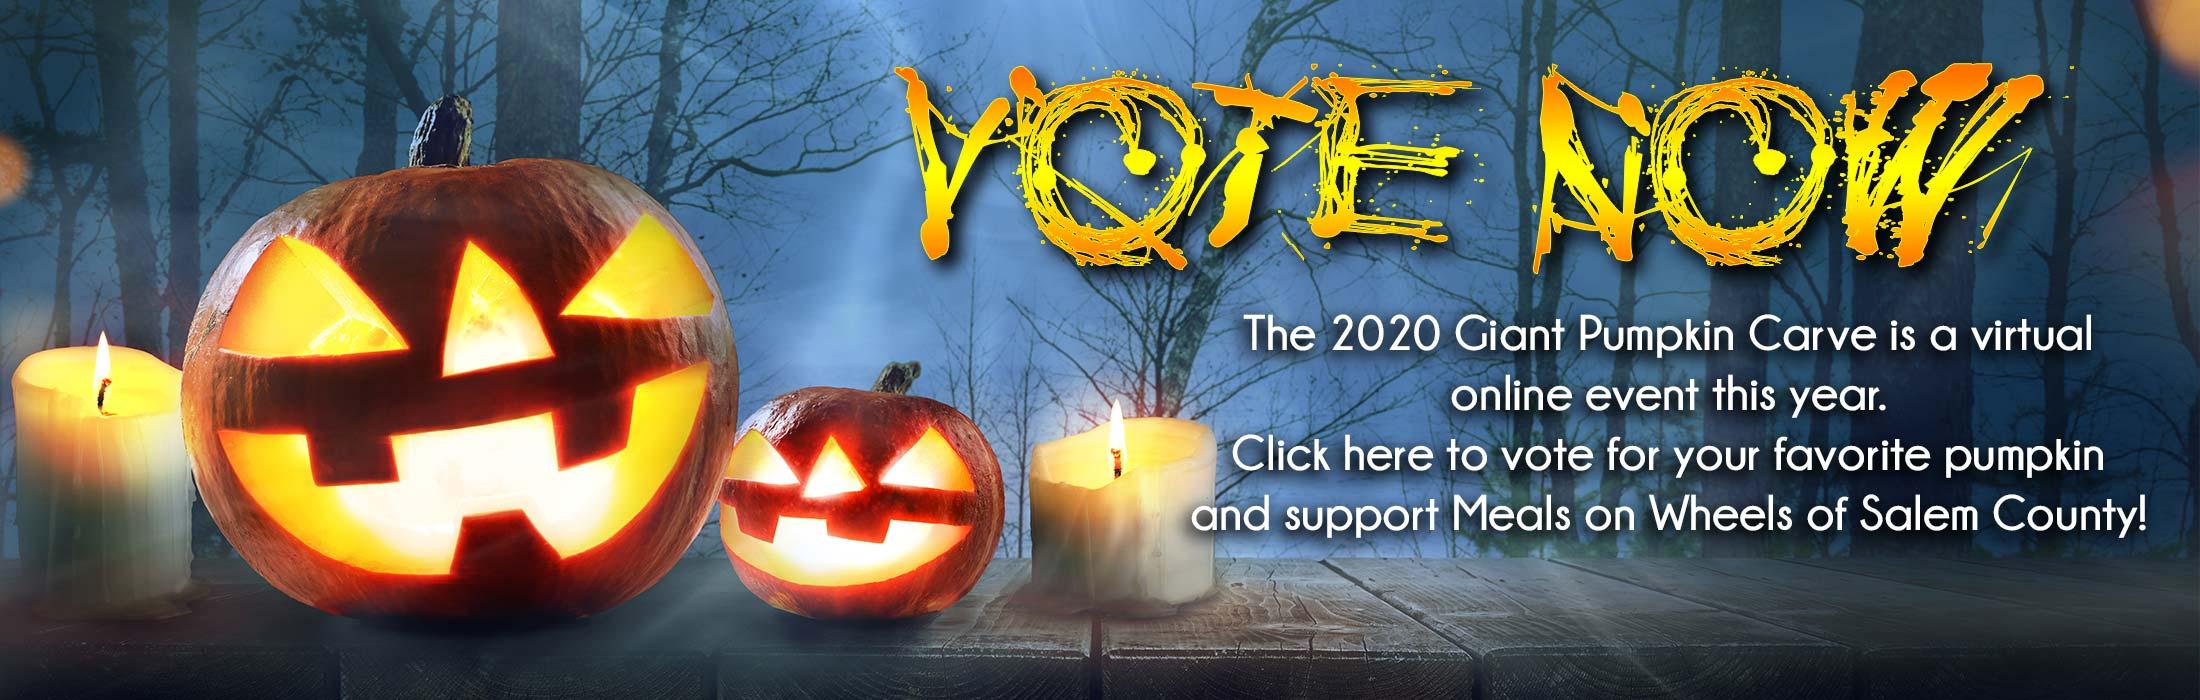 Giant Pumpkin Carve virtual event